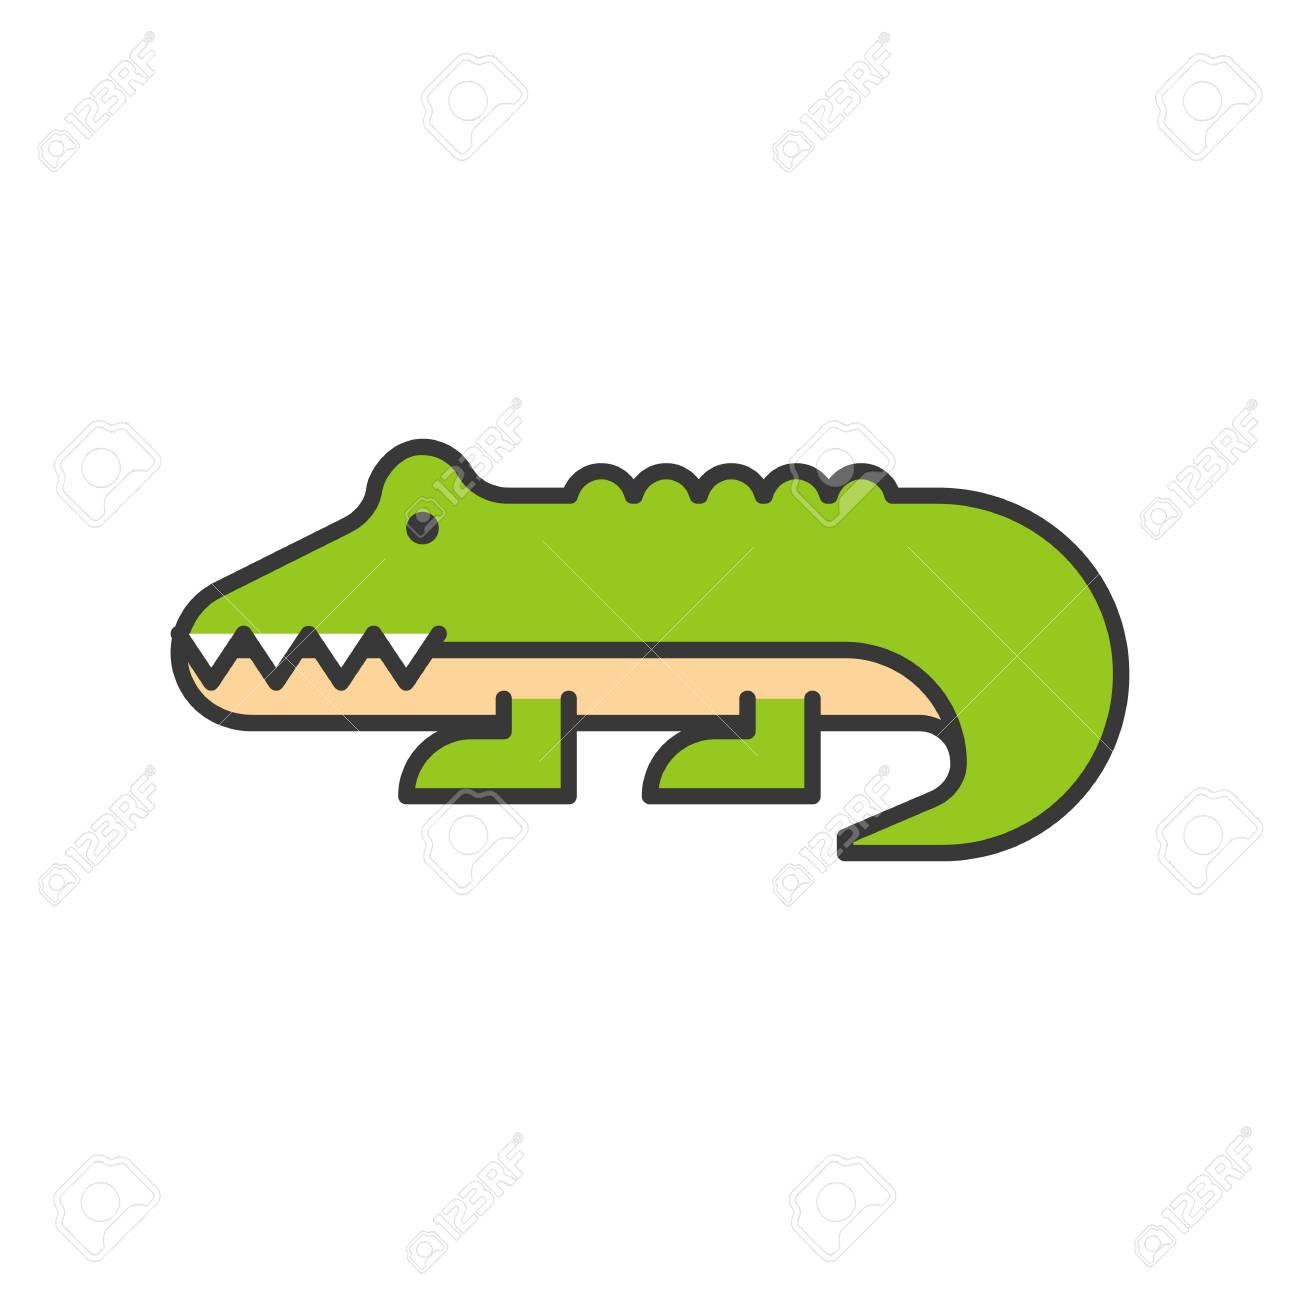 0529442d779d0 Alligator Or Crocodile Vector